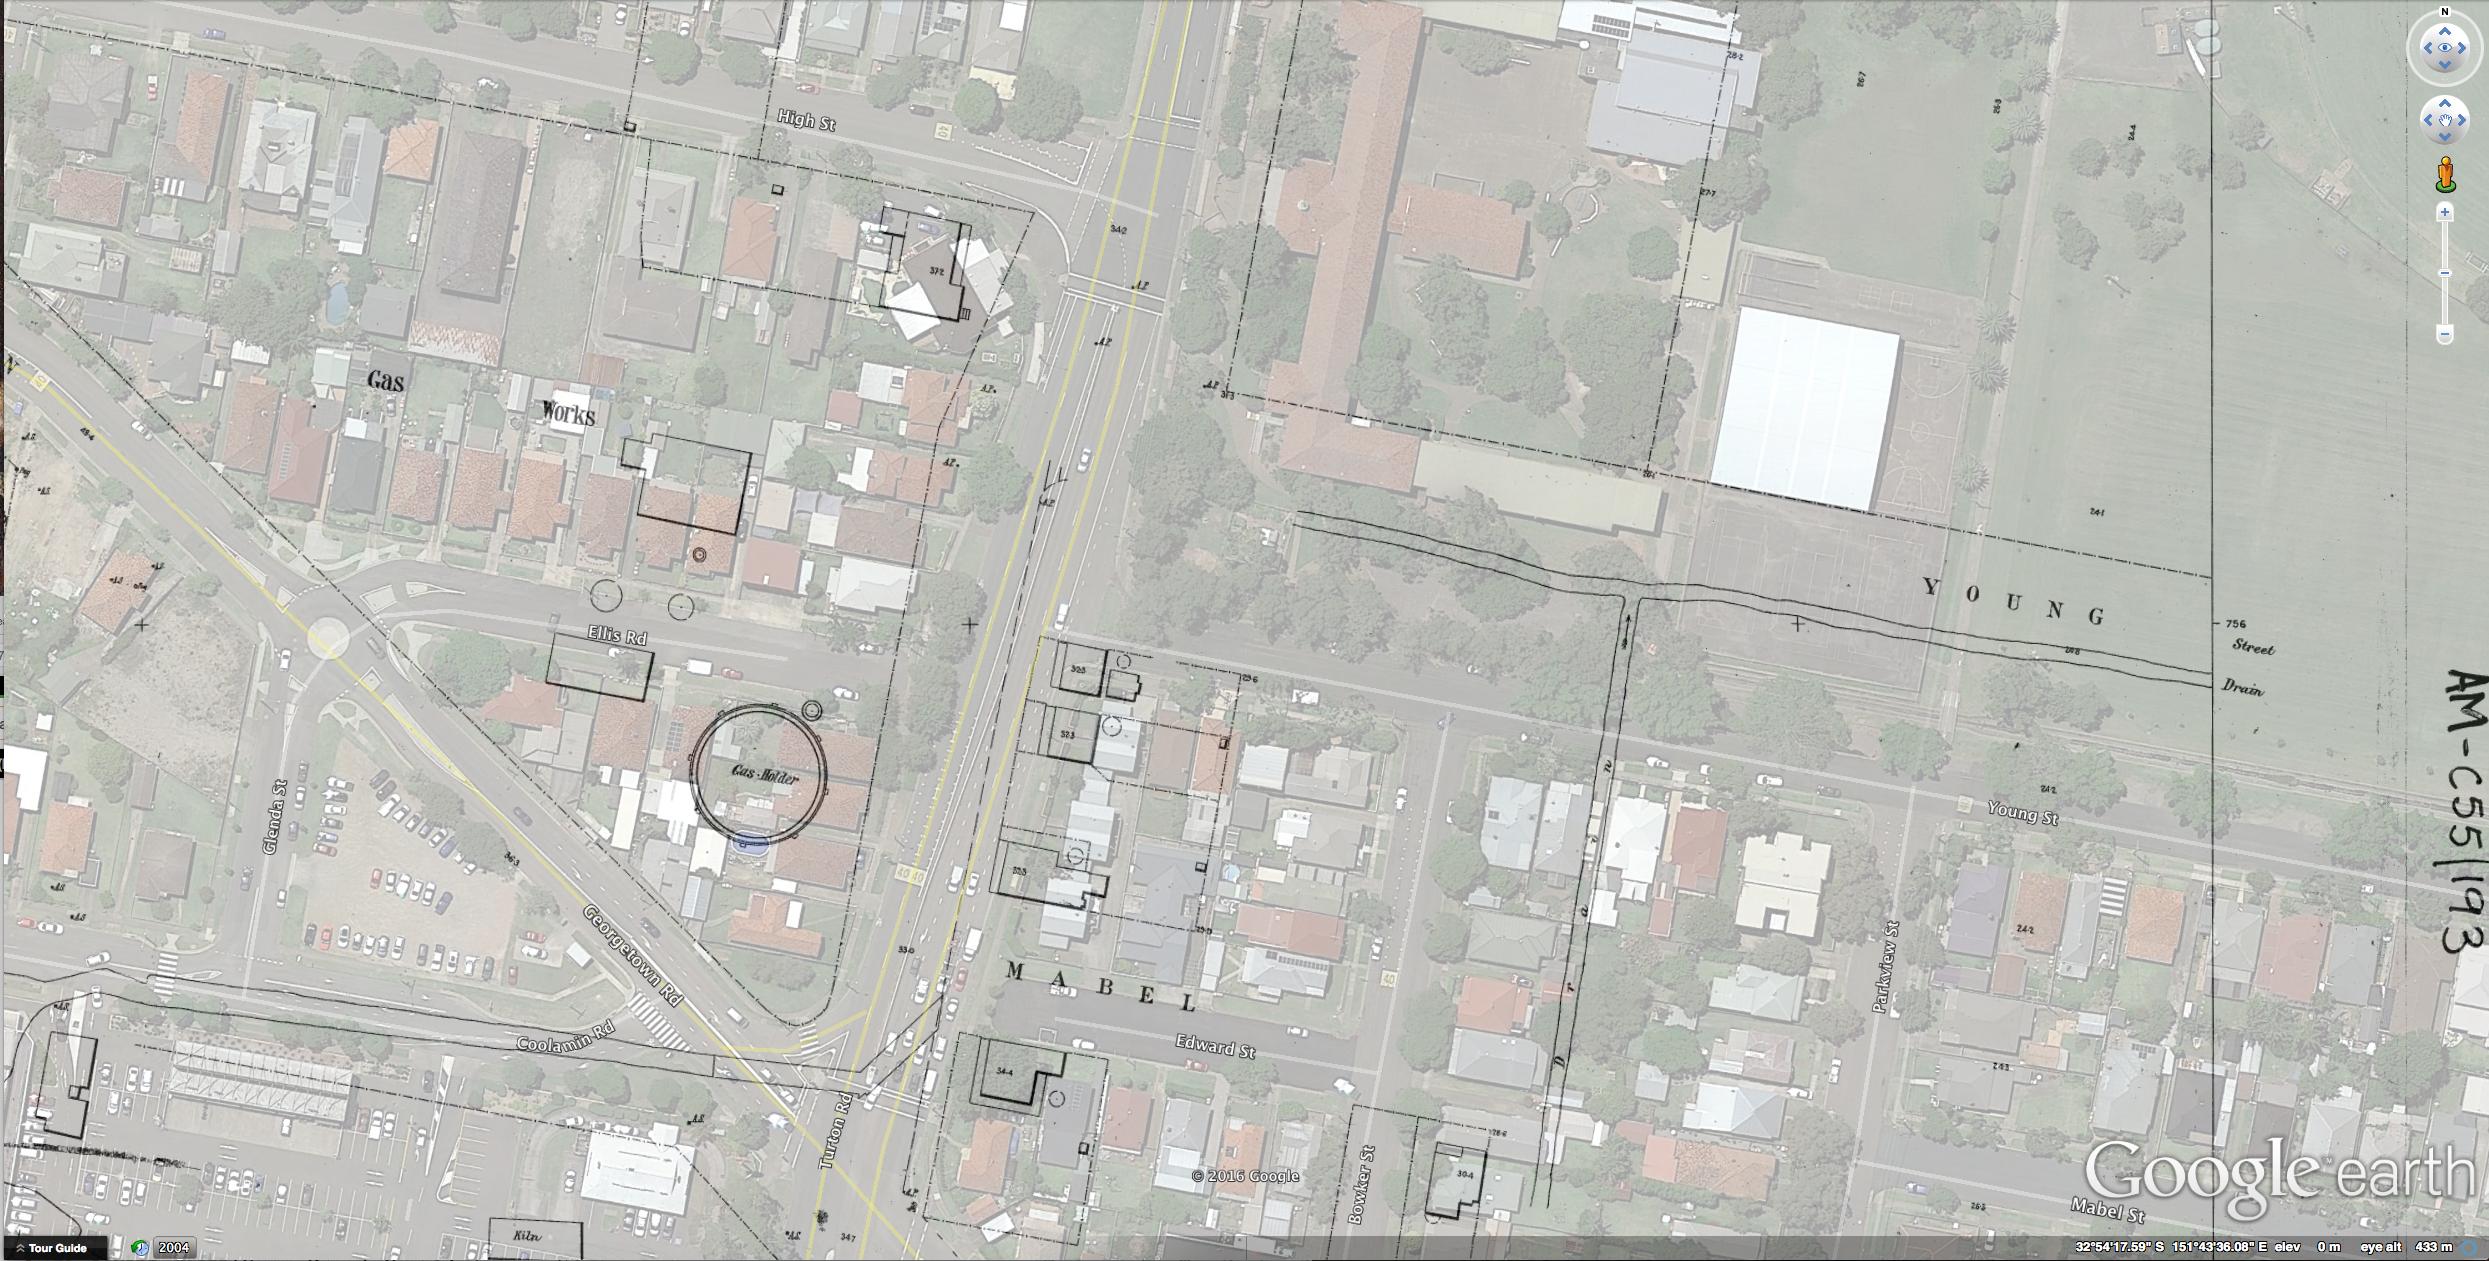 Waratah Gas Works Site overlay in Google Earth 2017